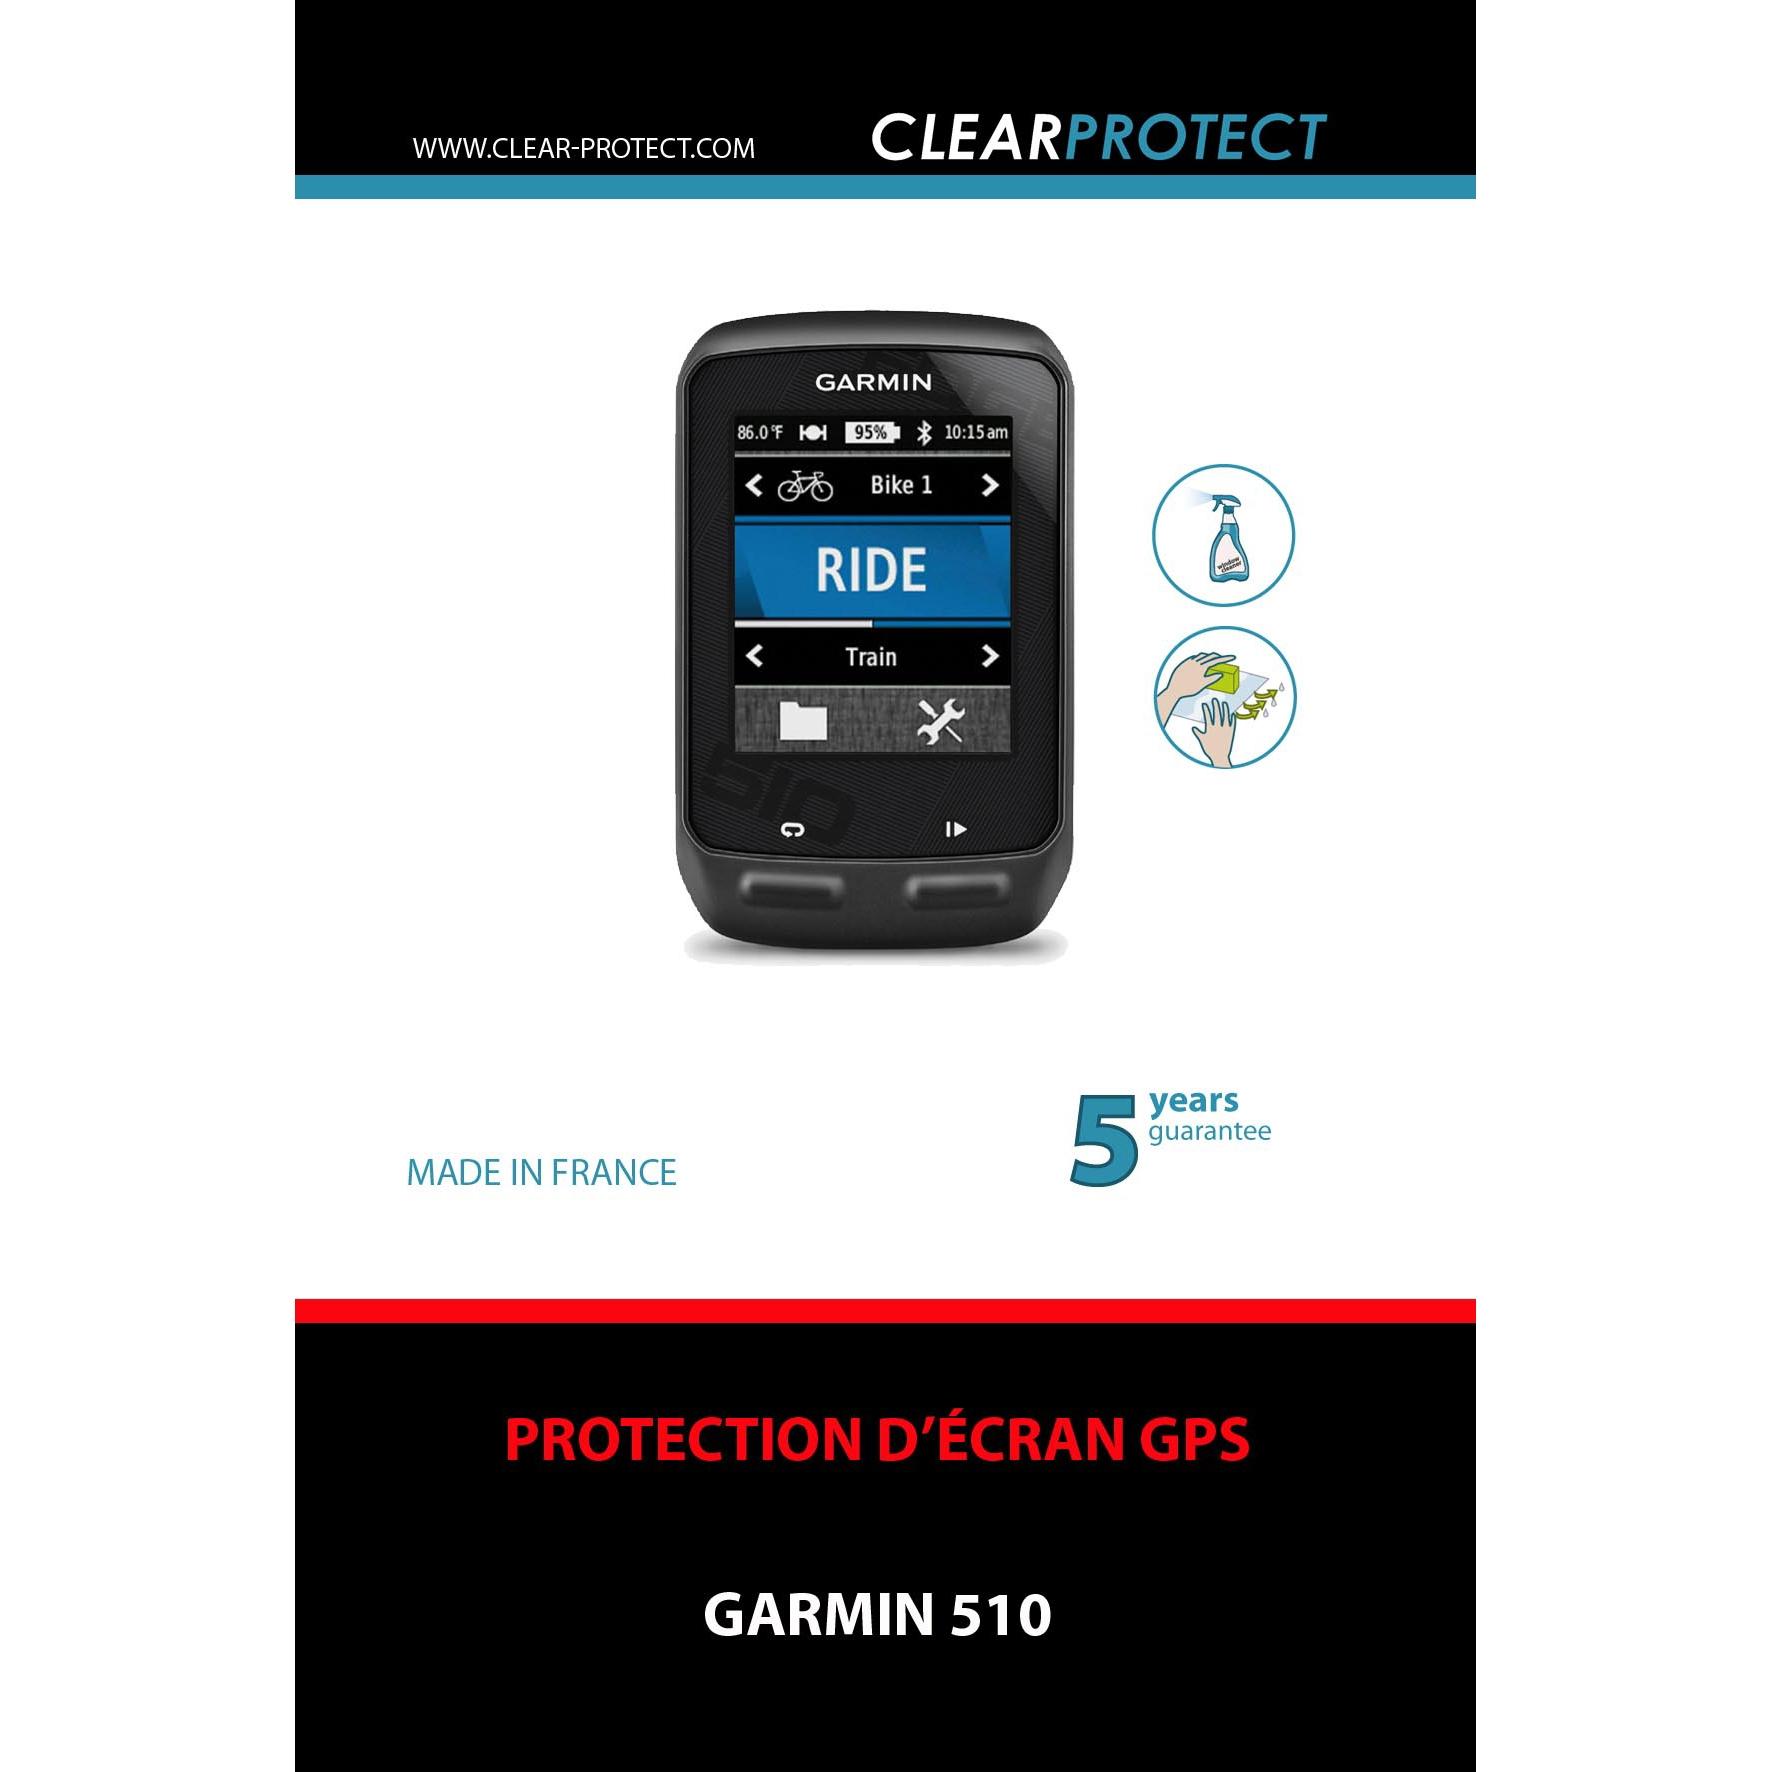 how to use garmin 510